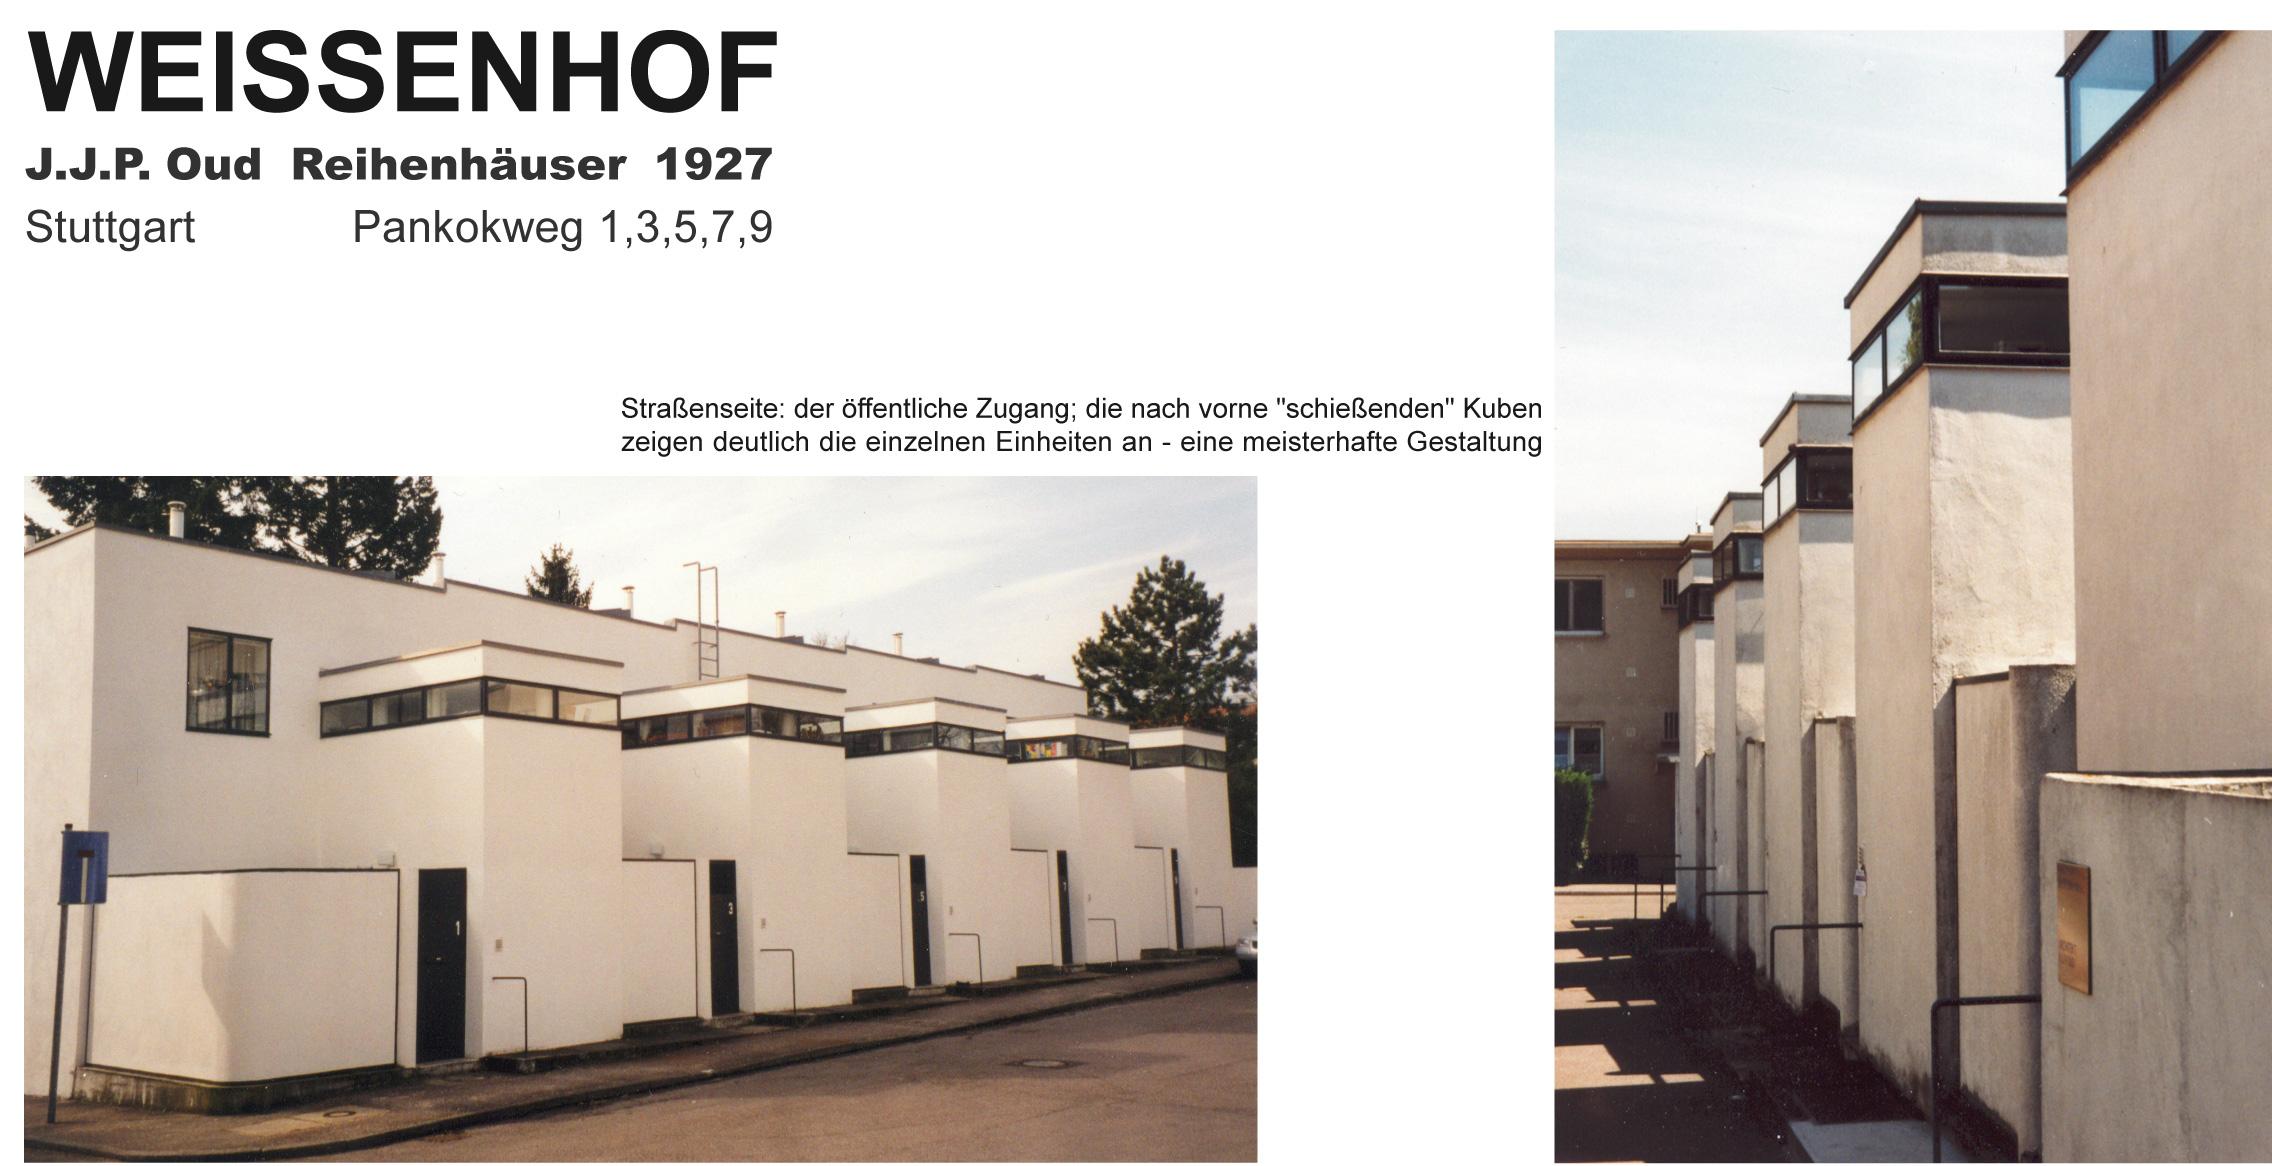 klassische moderne baden-württemberg ... size: 2272 x 1166 post ID: 3 File size: 0 B